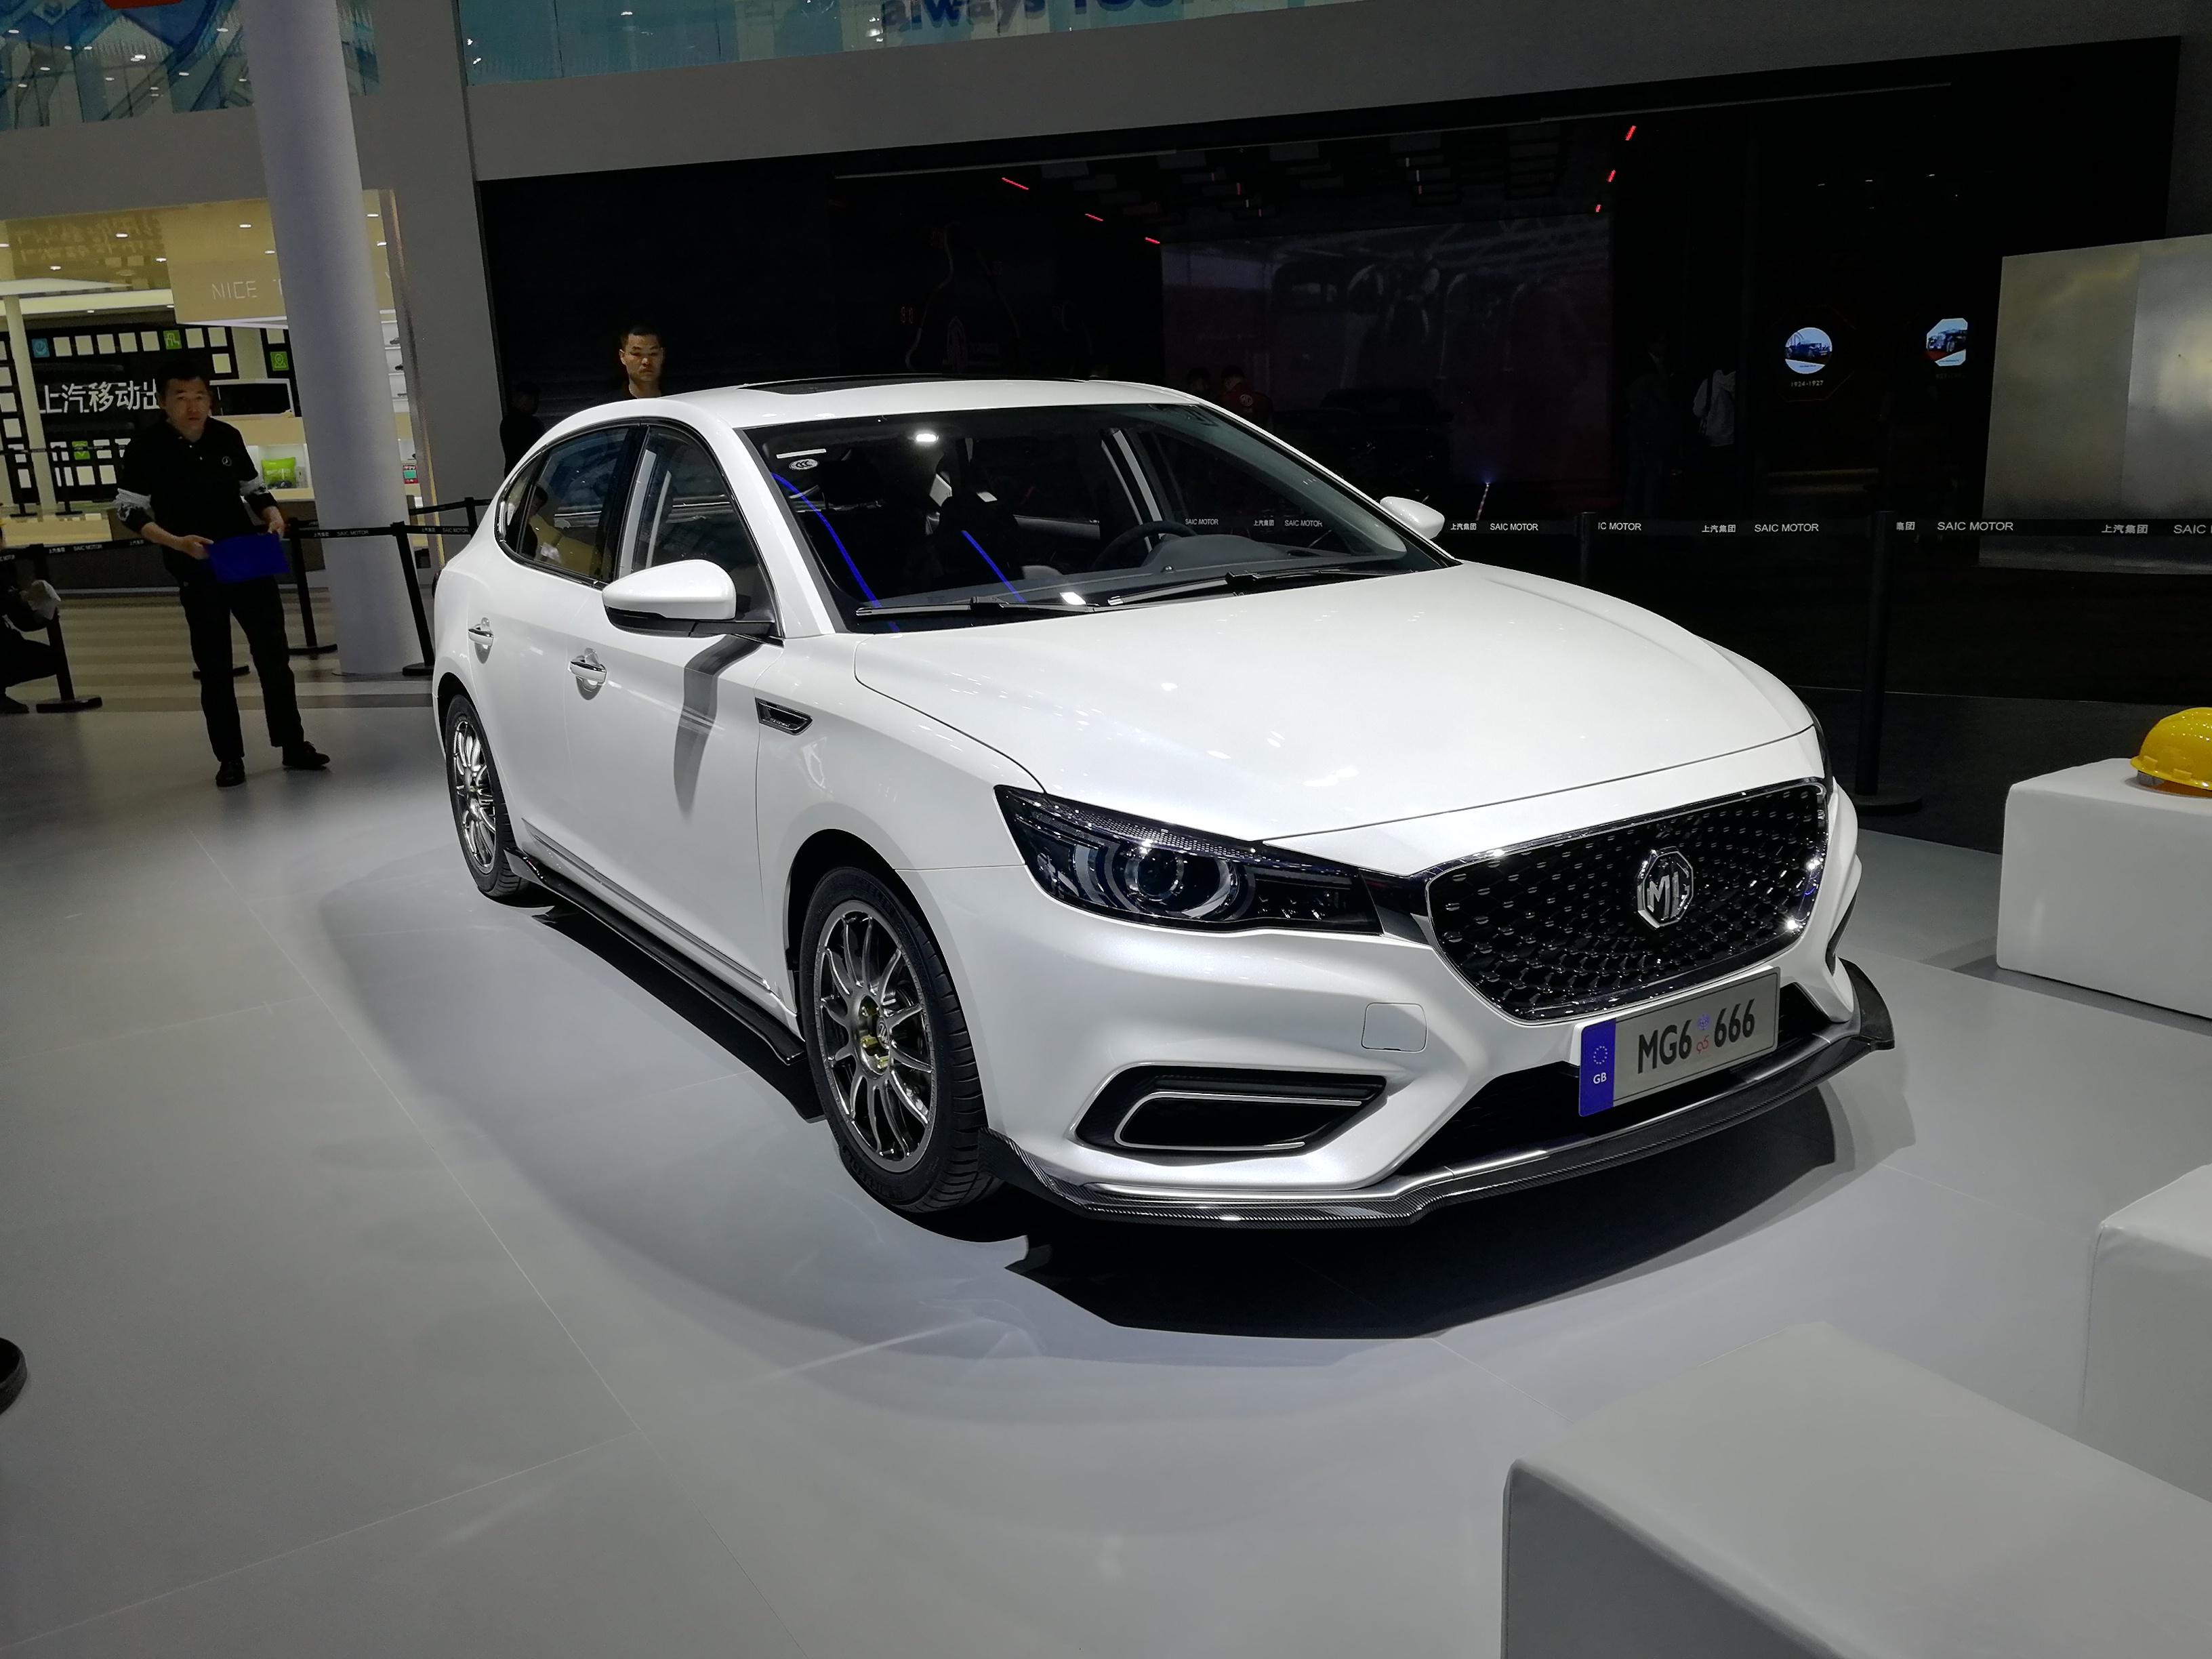 MG将推出2019款MG6改装版